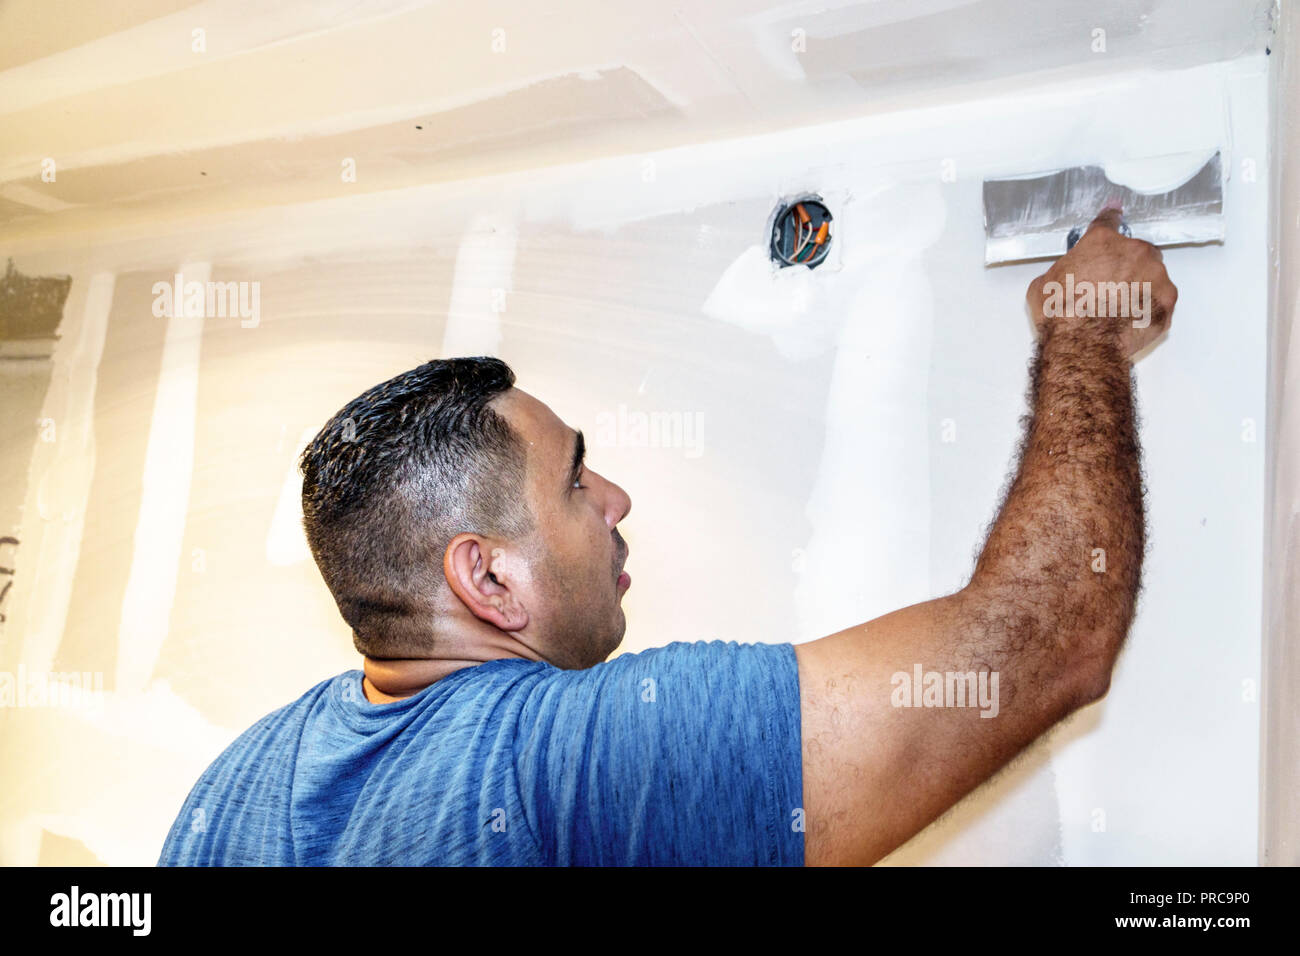 Miami Beach Florida contractor renovation repair drywall Hispanic man working spreading plaster compound putty scraper knife - Stock Image